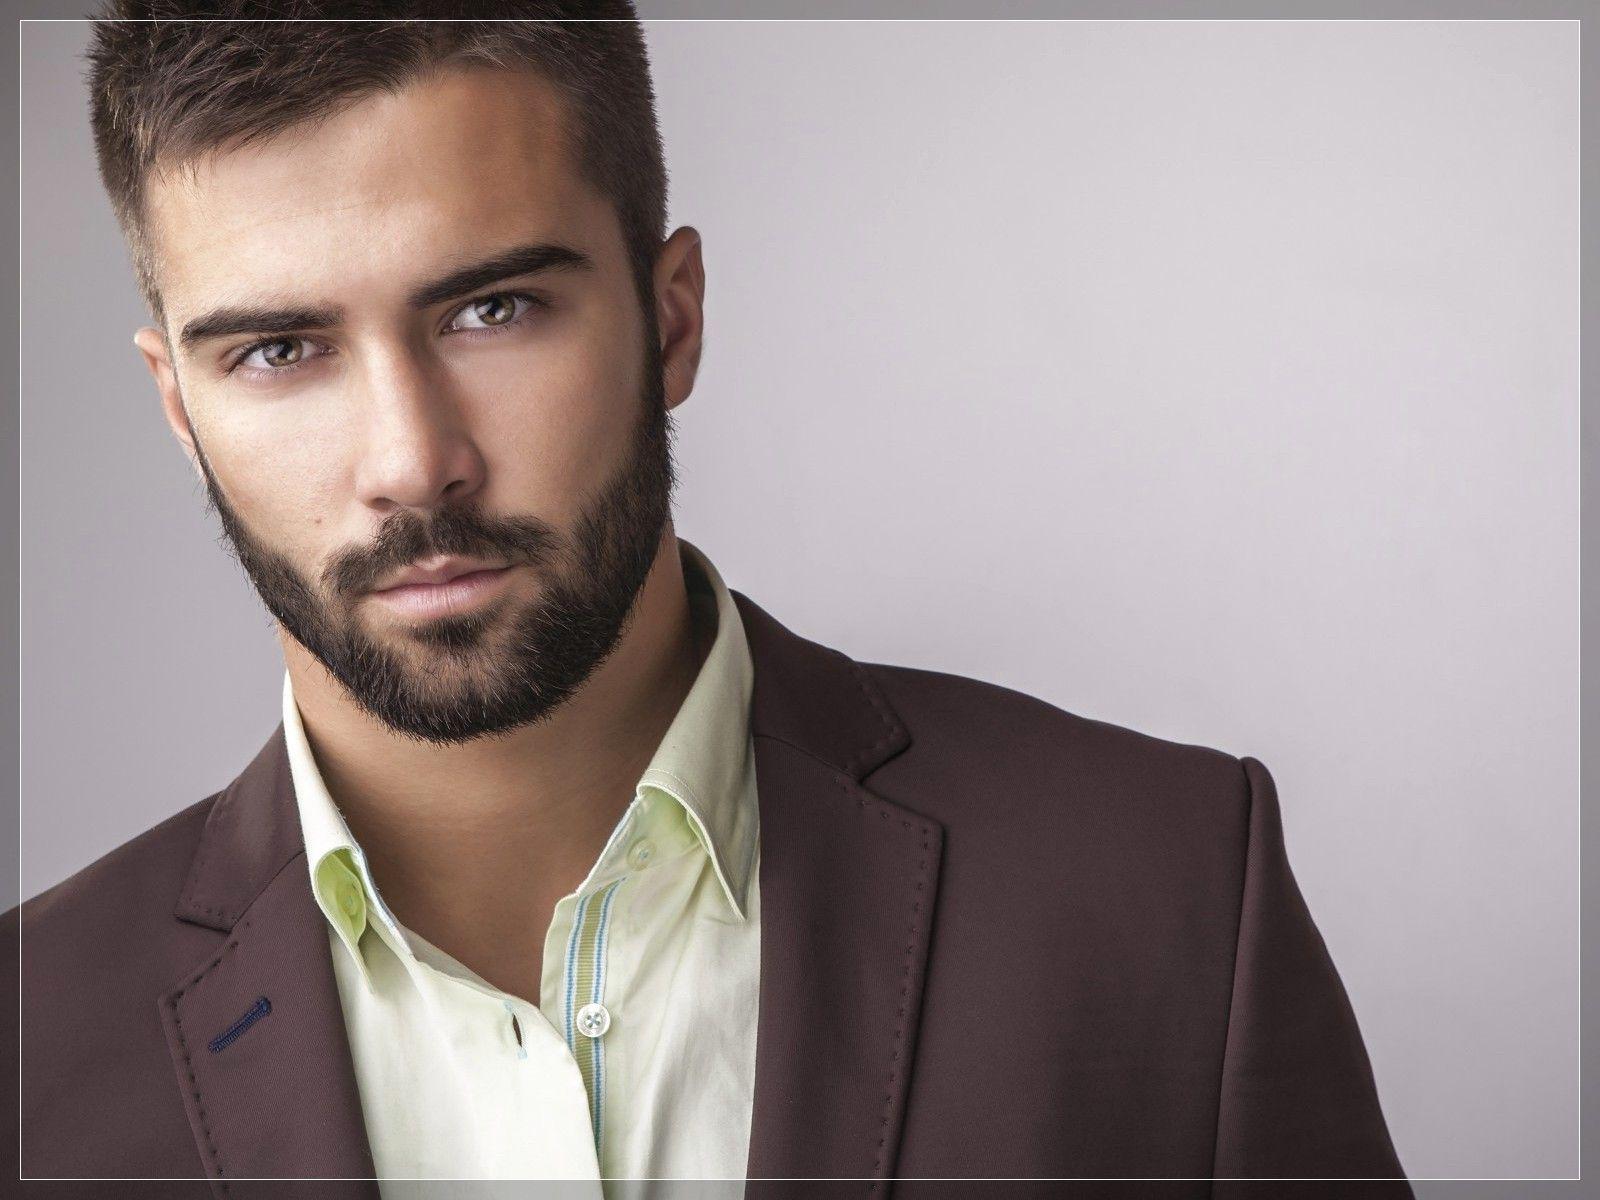 Super Face Facial Hairstyles Men And Beard And Hairstyles On Pinterest Short Hairstyles For Black Women Fulllsitofus